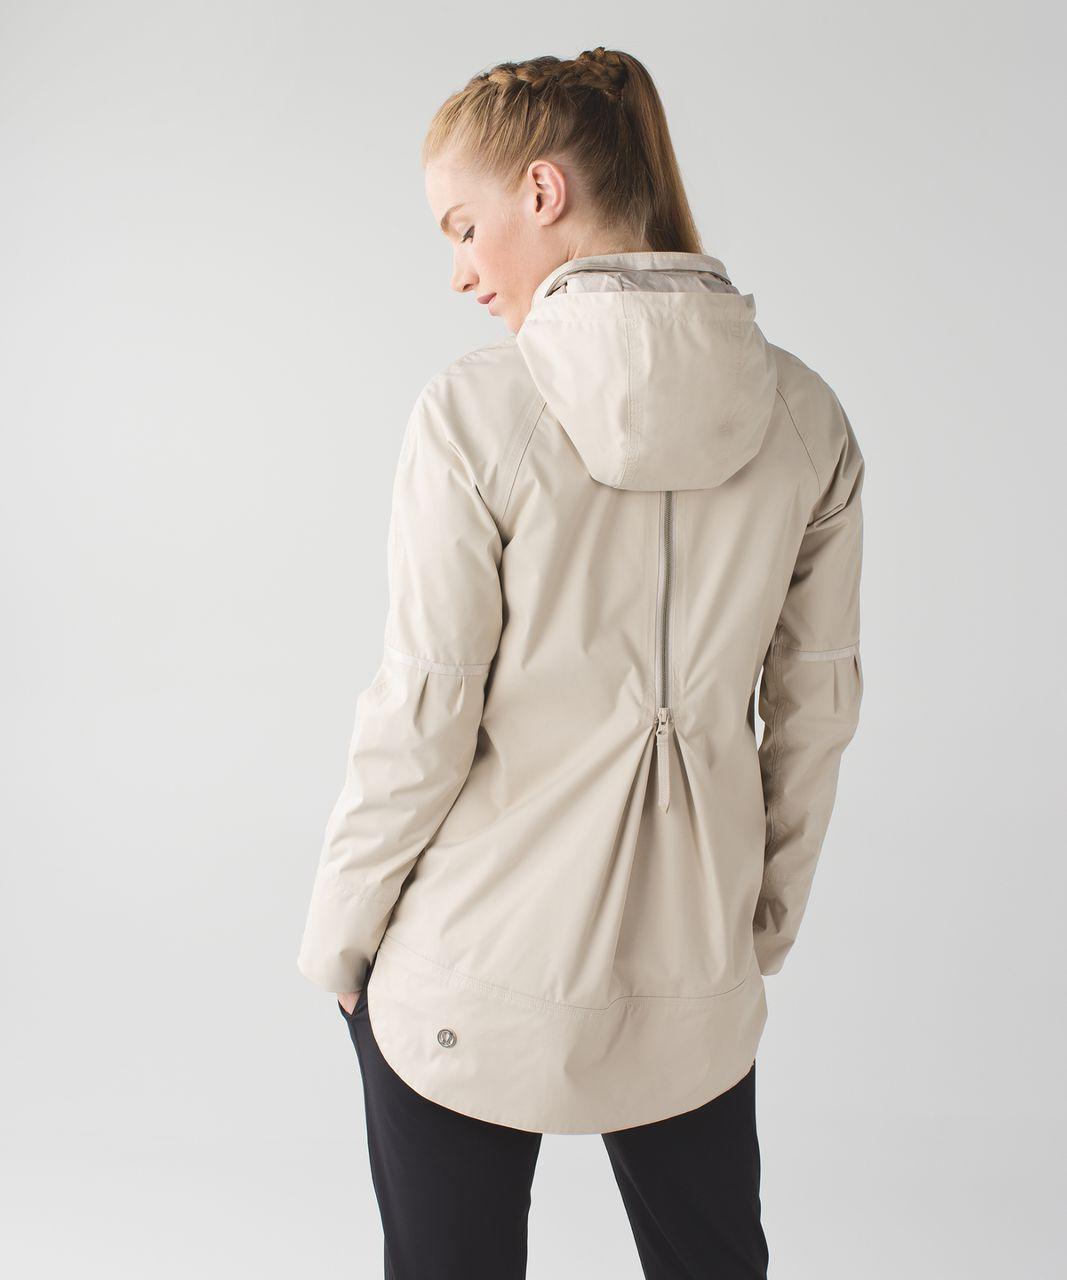 Lululemon Fo Drizzle Jacket Cashew Lulu Fanatics